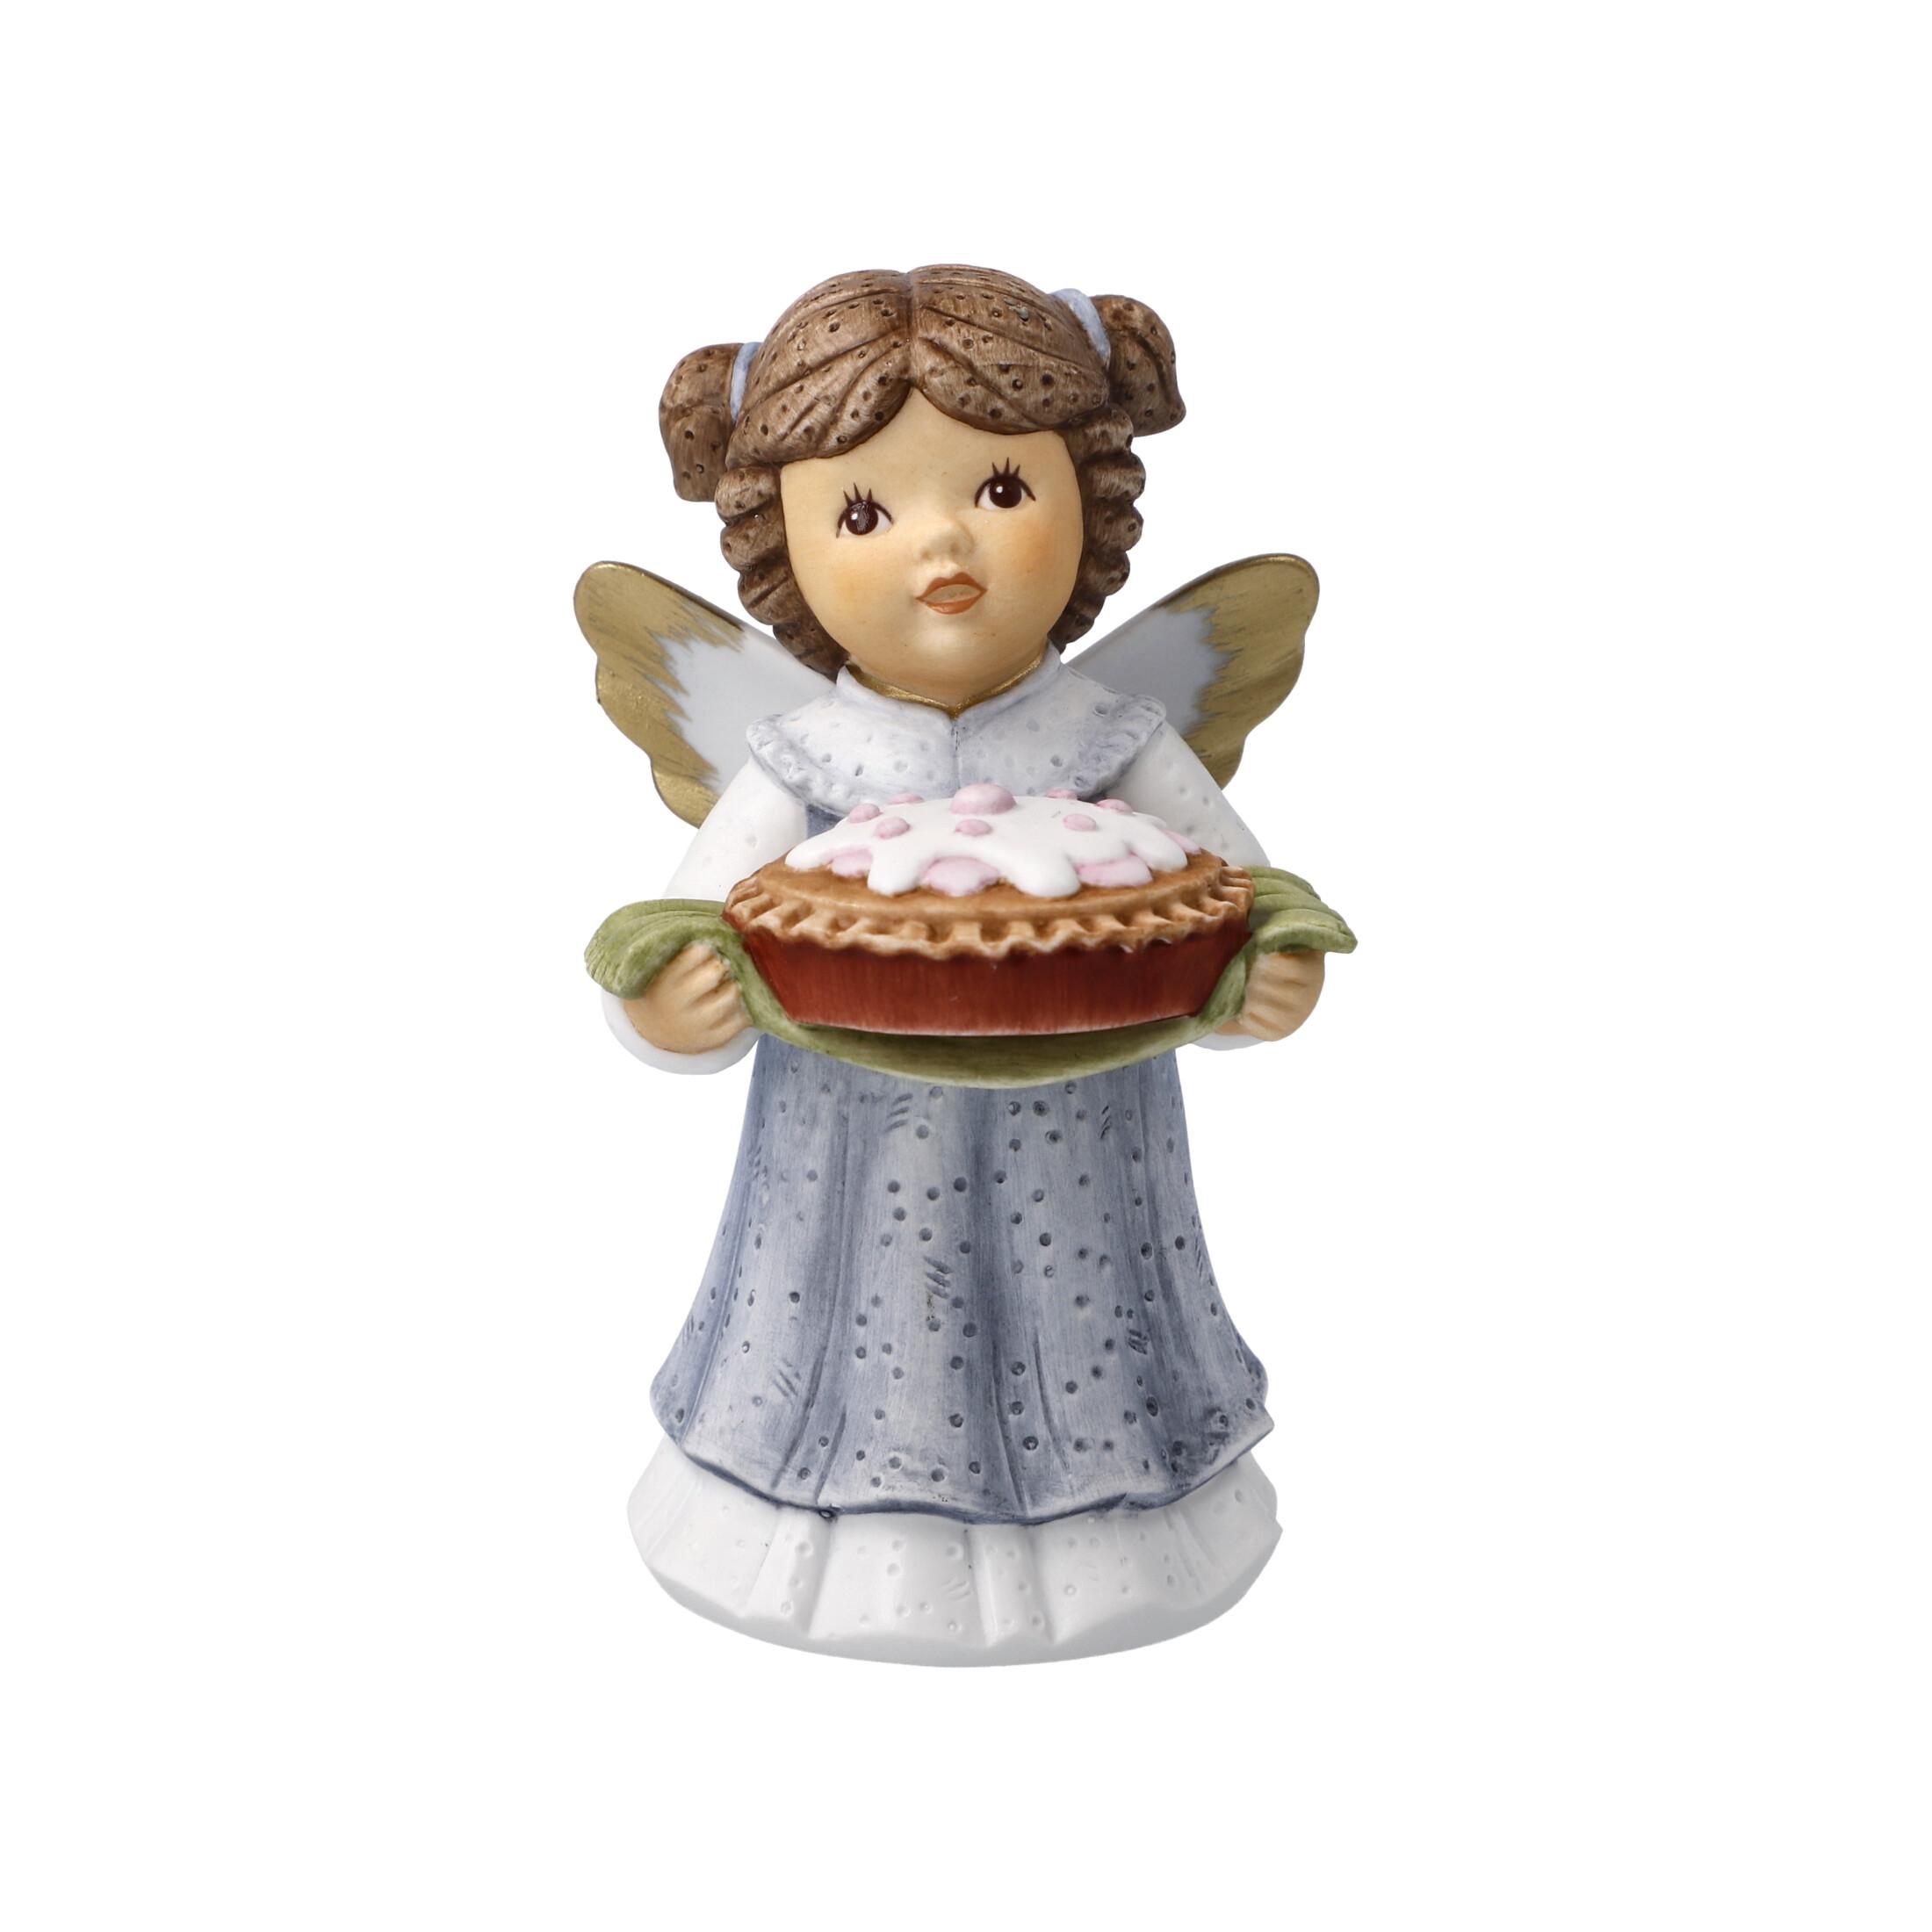 Goebel Nina & Marco Weihnachtsbäckerei 'NM P Leckerer Kuchen zum Fest' 2021